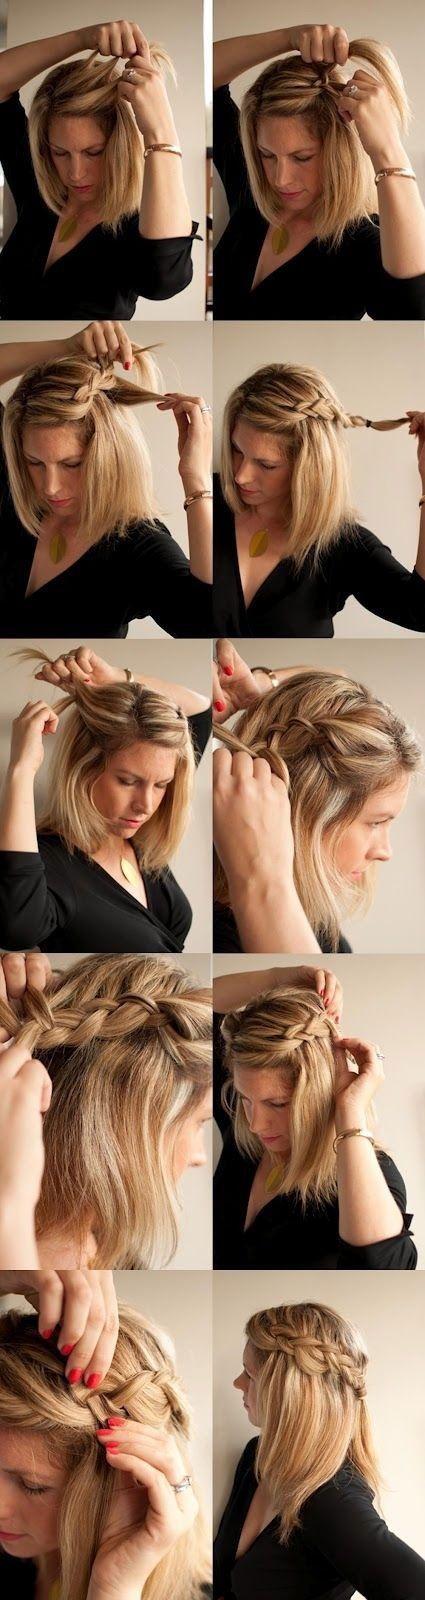 Coiffure Cheveux Mi Longs Coiffure Simple Et Facile Coiffures